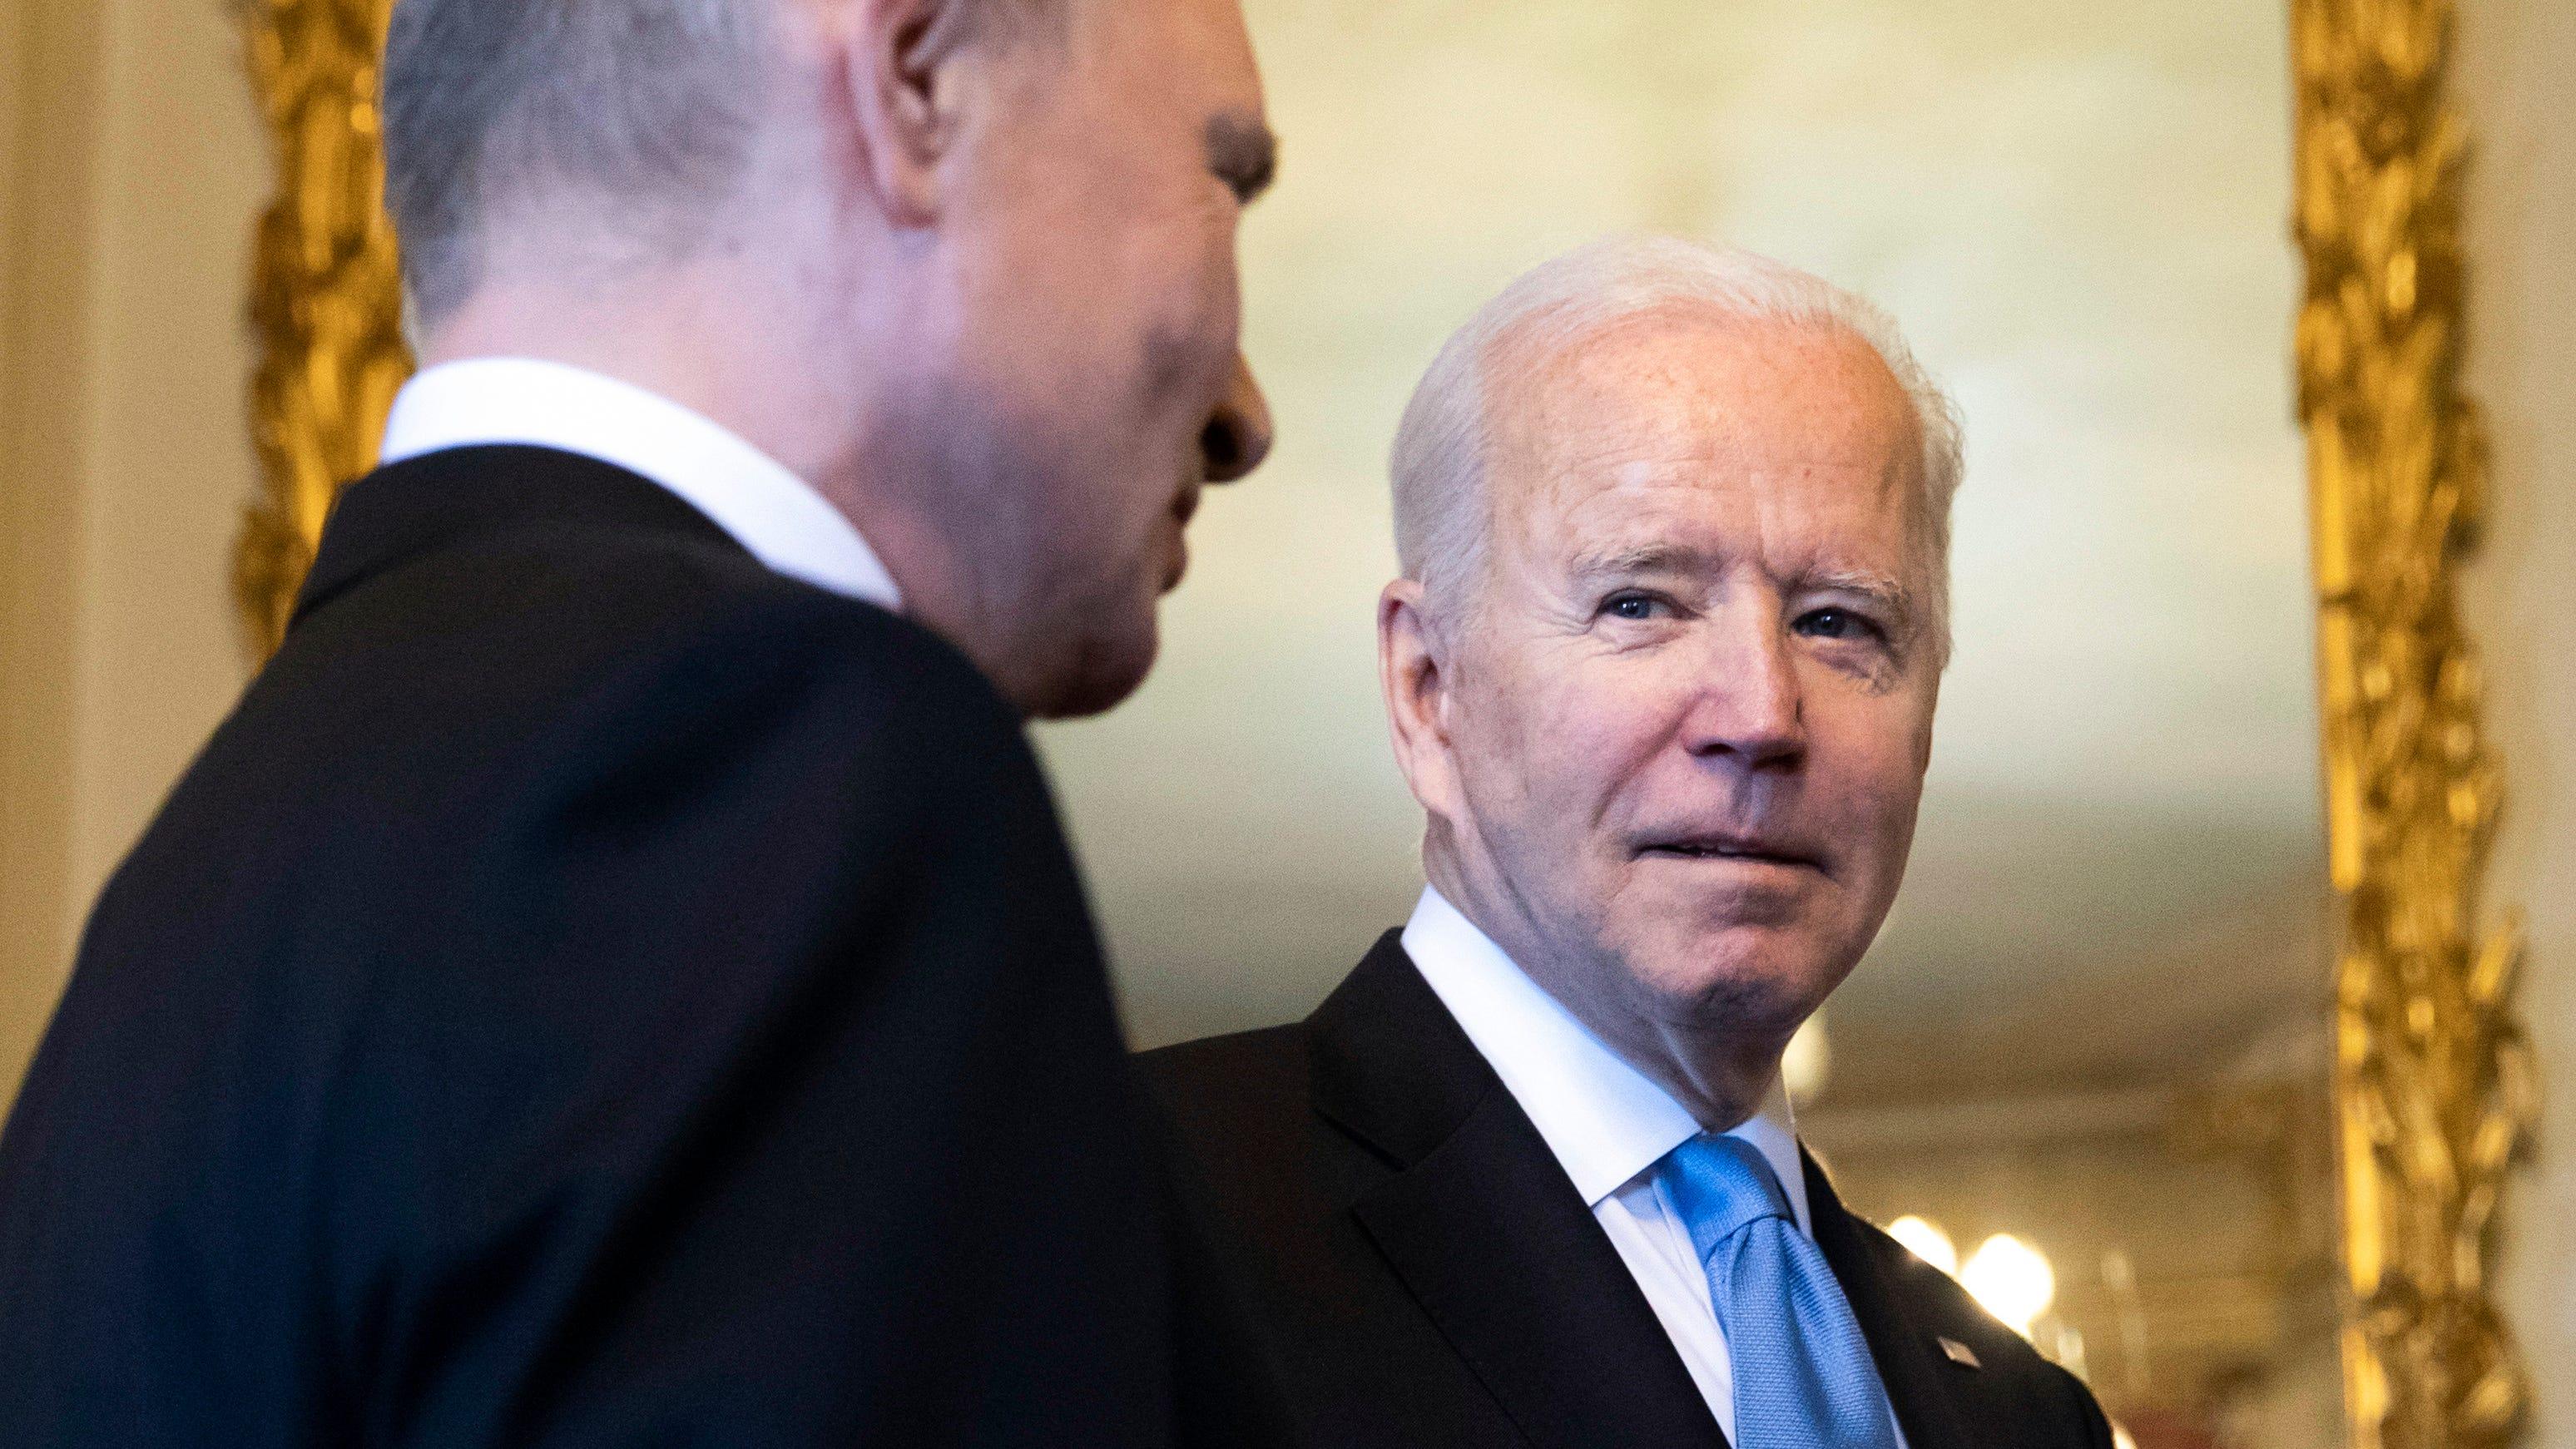 Joe Biden, the U.S. president who in Geneva didn't shame America like Trump in Helsinki